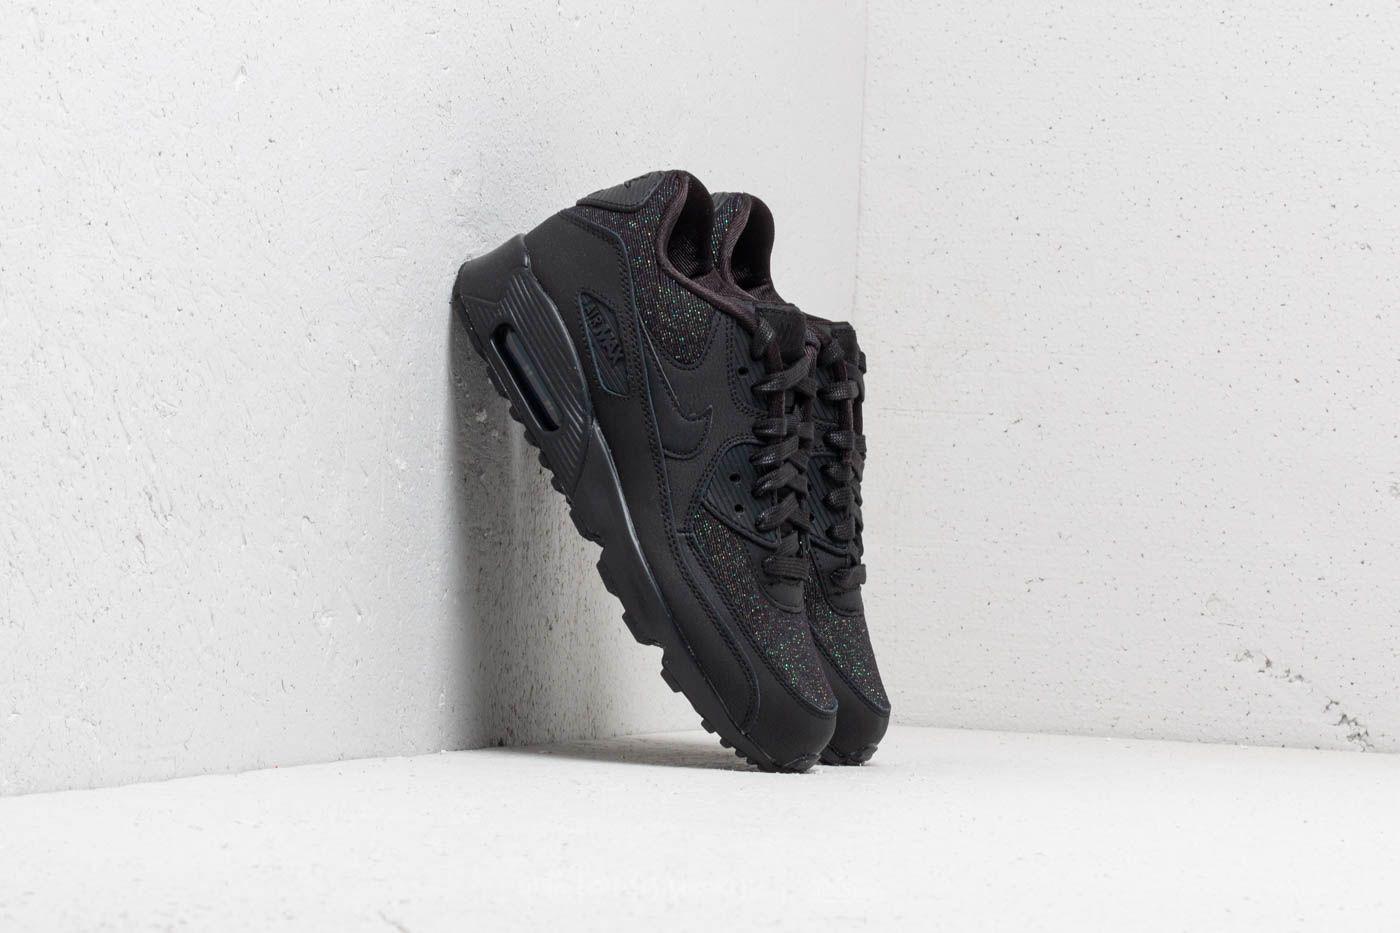 wholesale dealer dbb11 32bd2 Nike Air Max 90 SE Mesh (GS). Black  Black-Anthracite